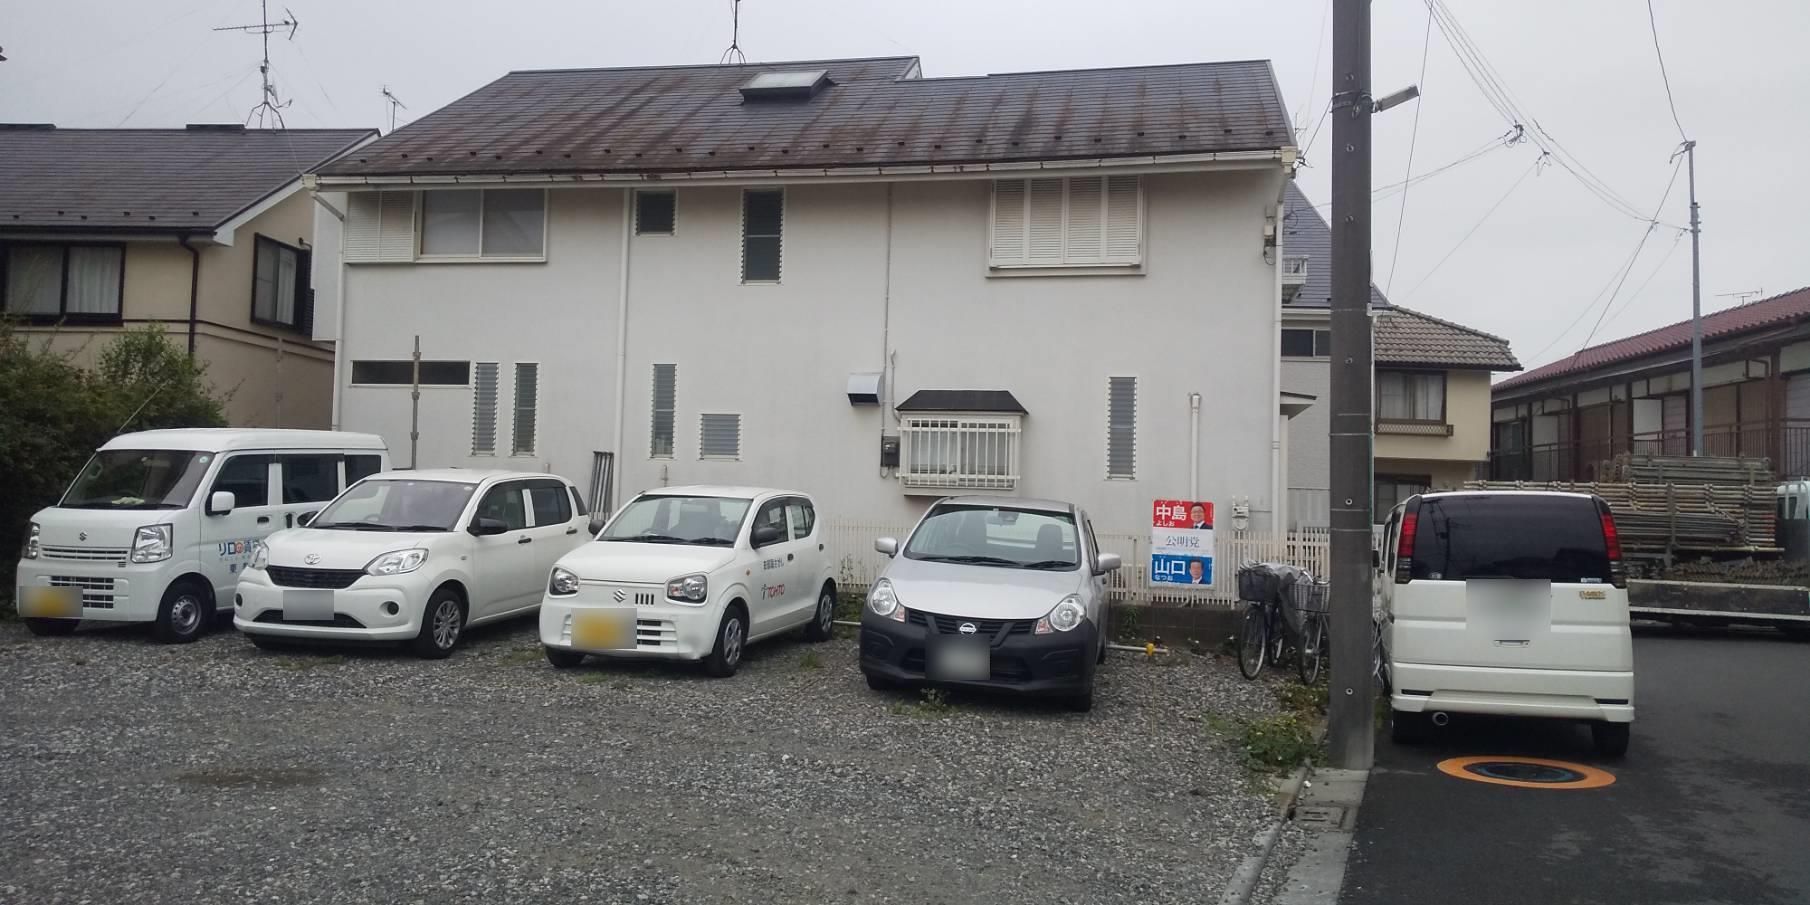 【施工実績】狛江市:一般住宅の屋根、外壁、コーキング補修工事